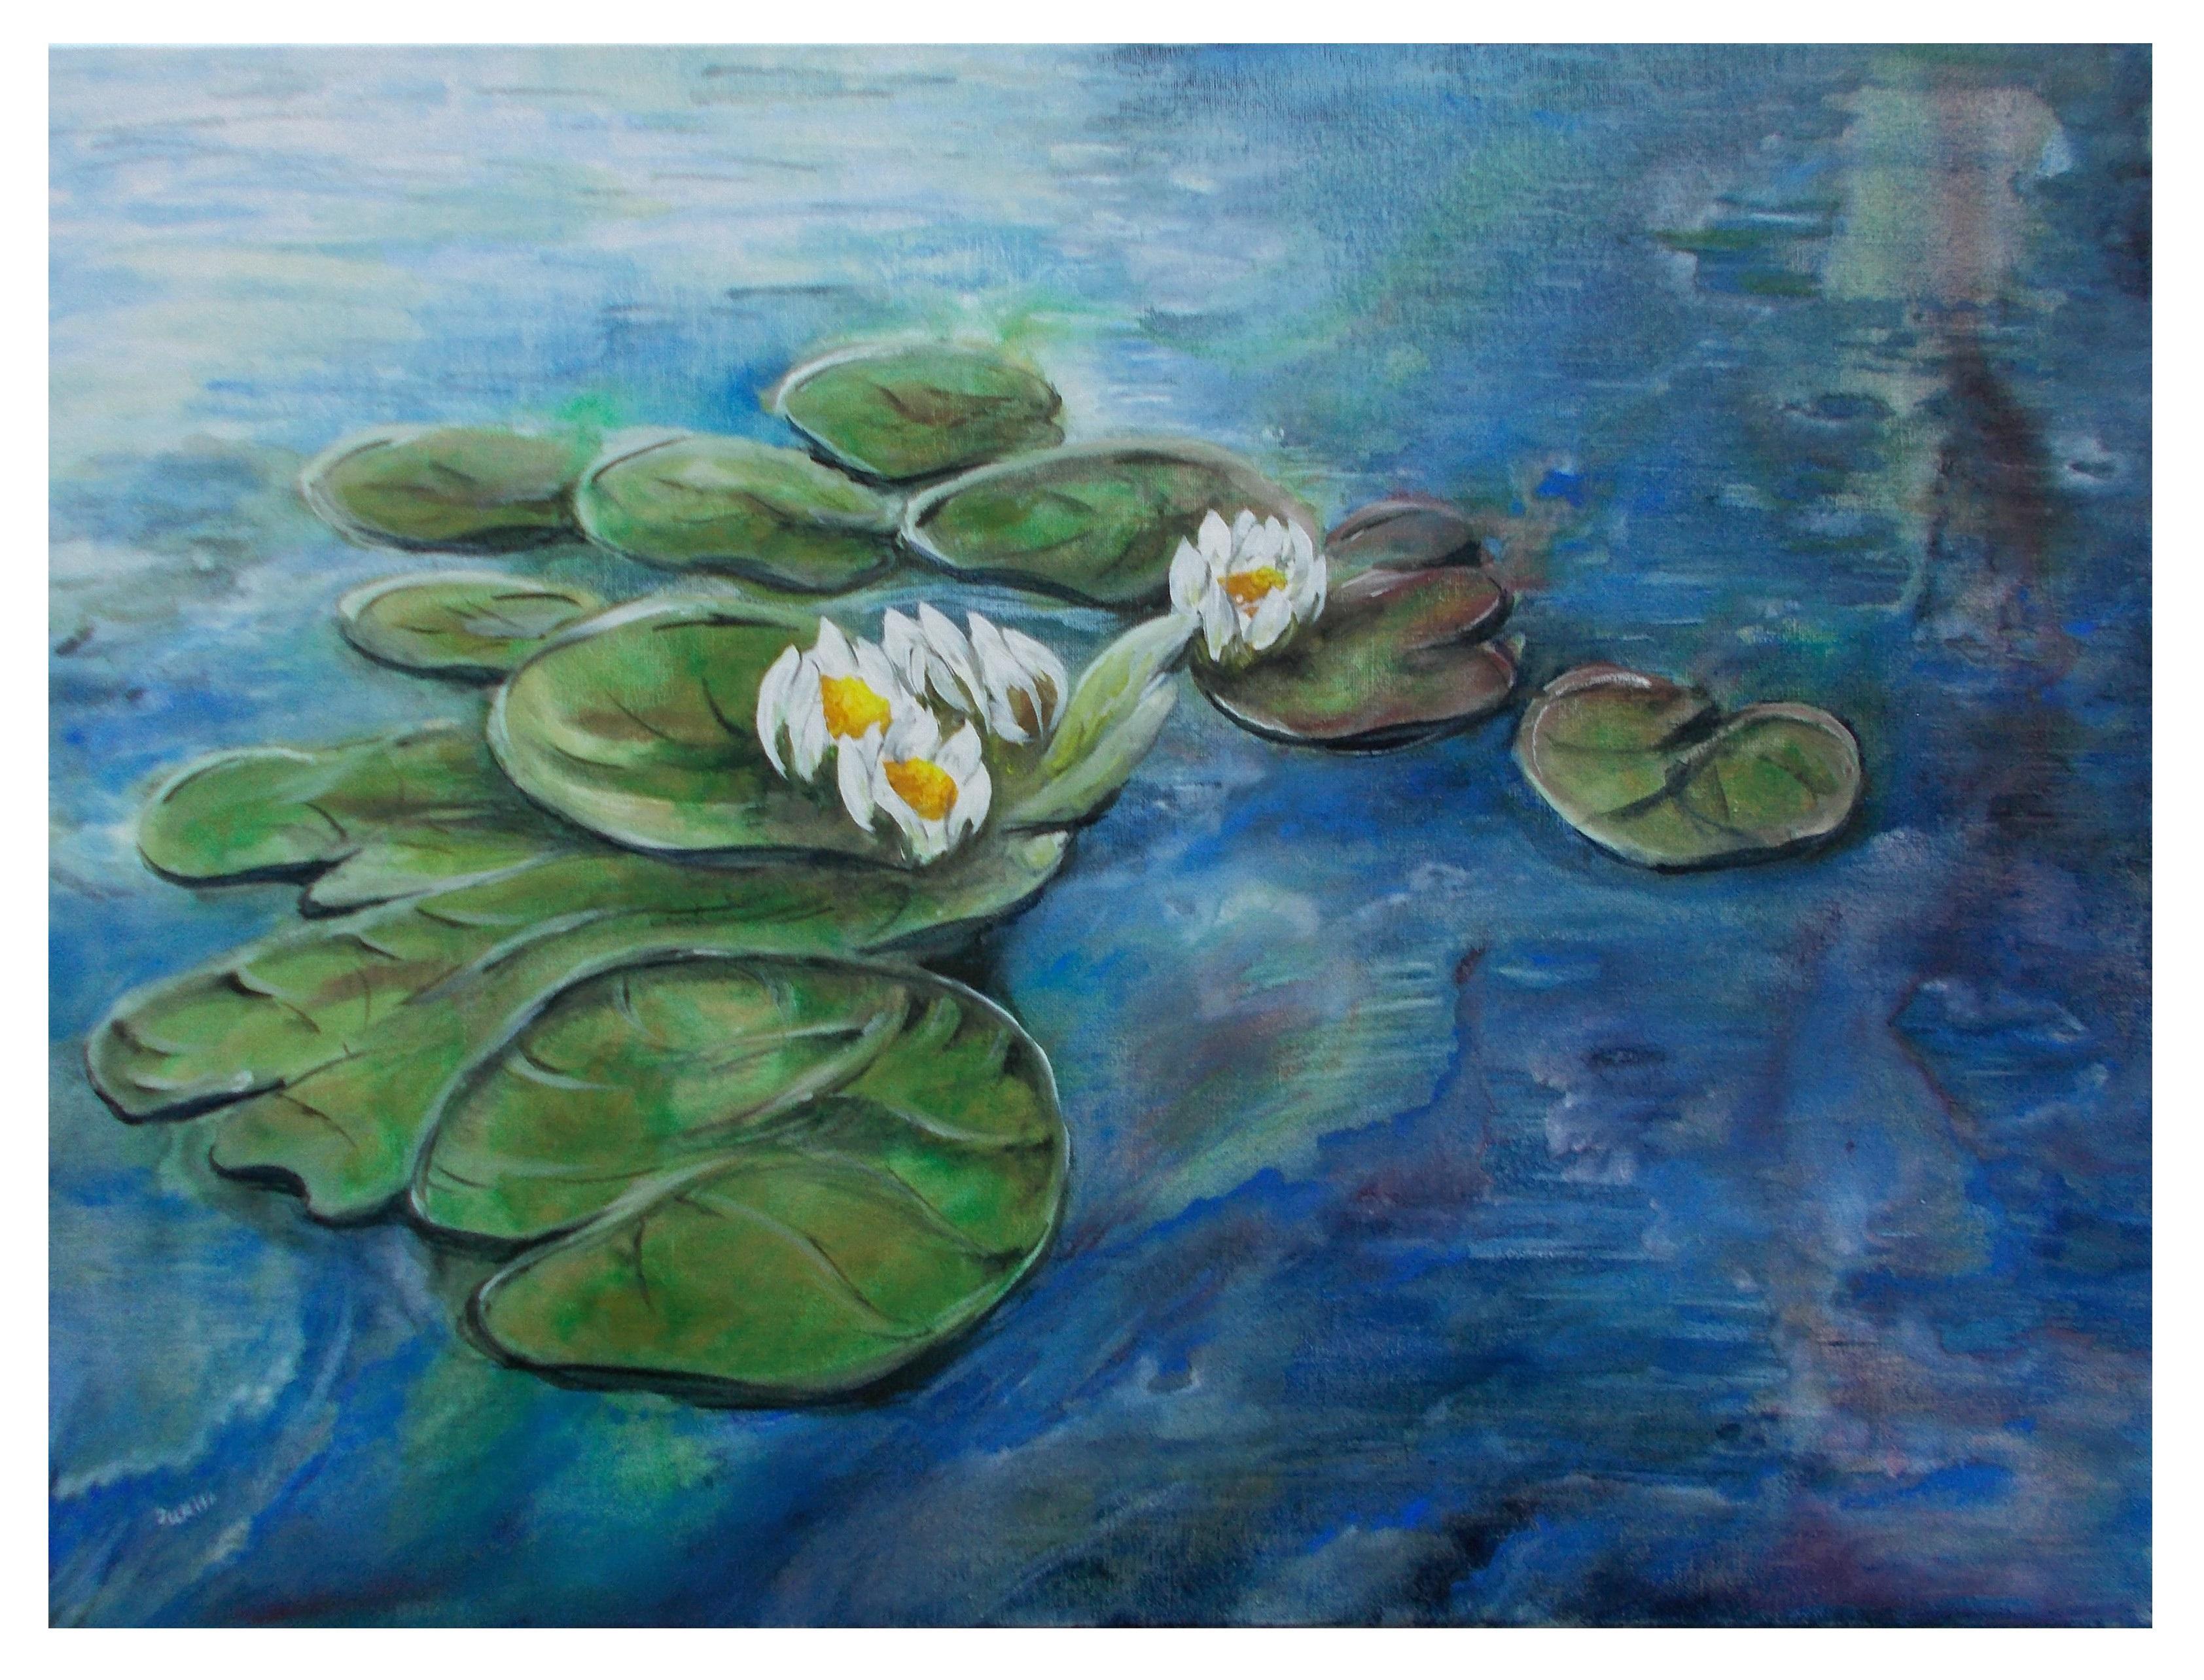 Harshavardhan Rane lilies - acrylic on canvas -2019 (1)